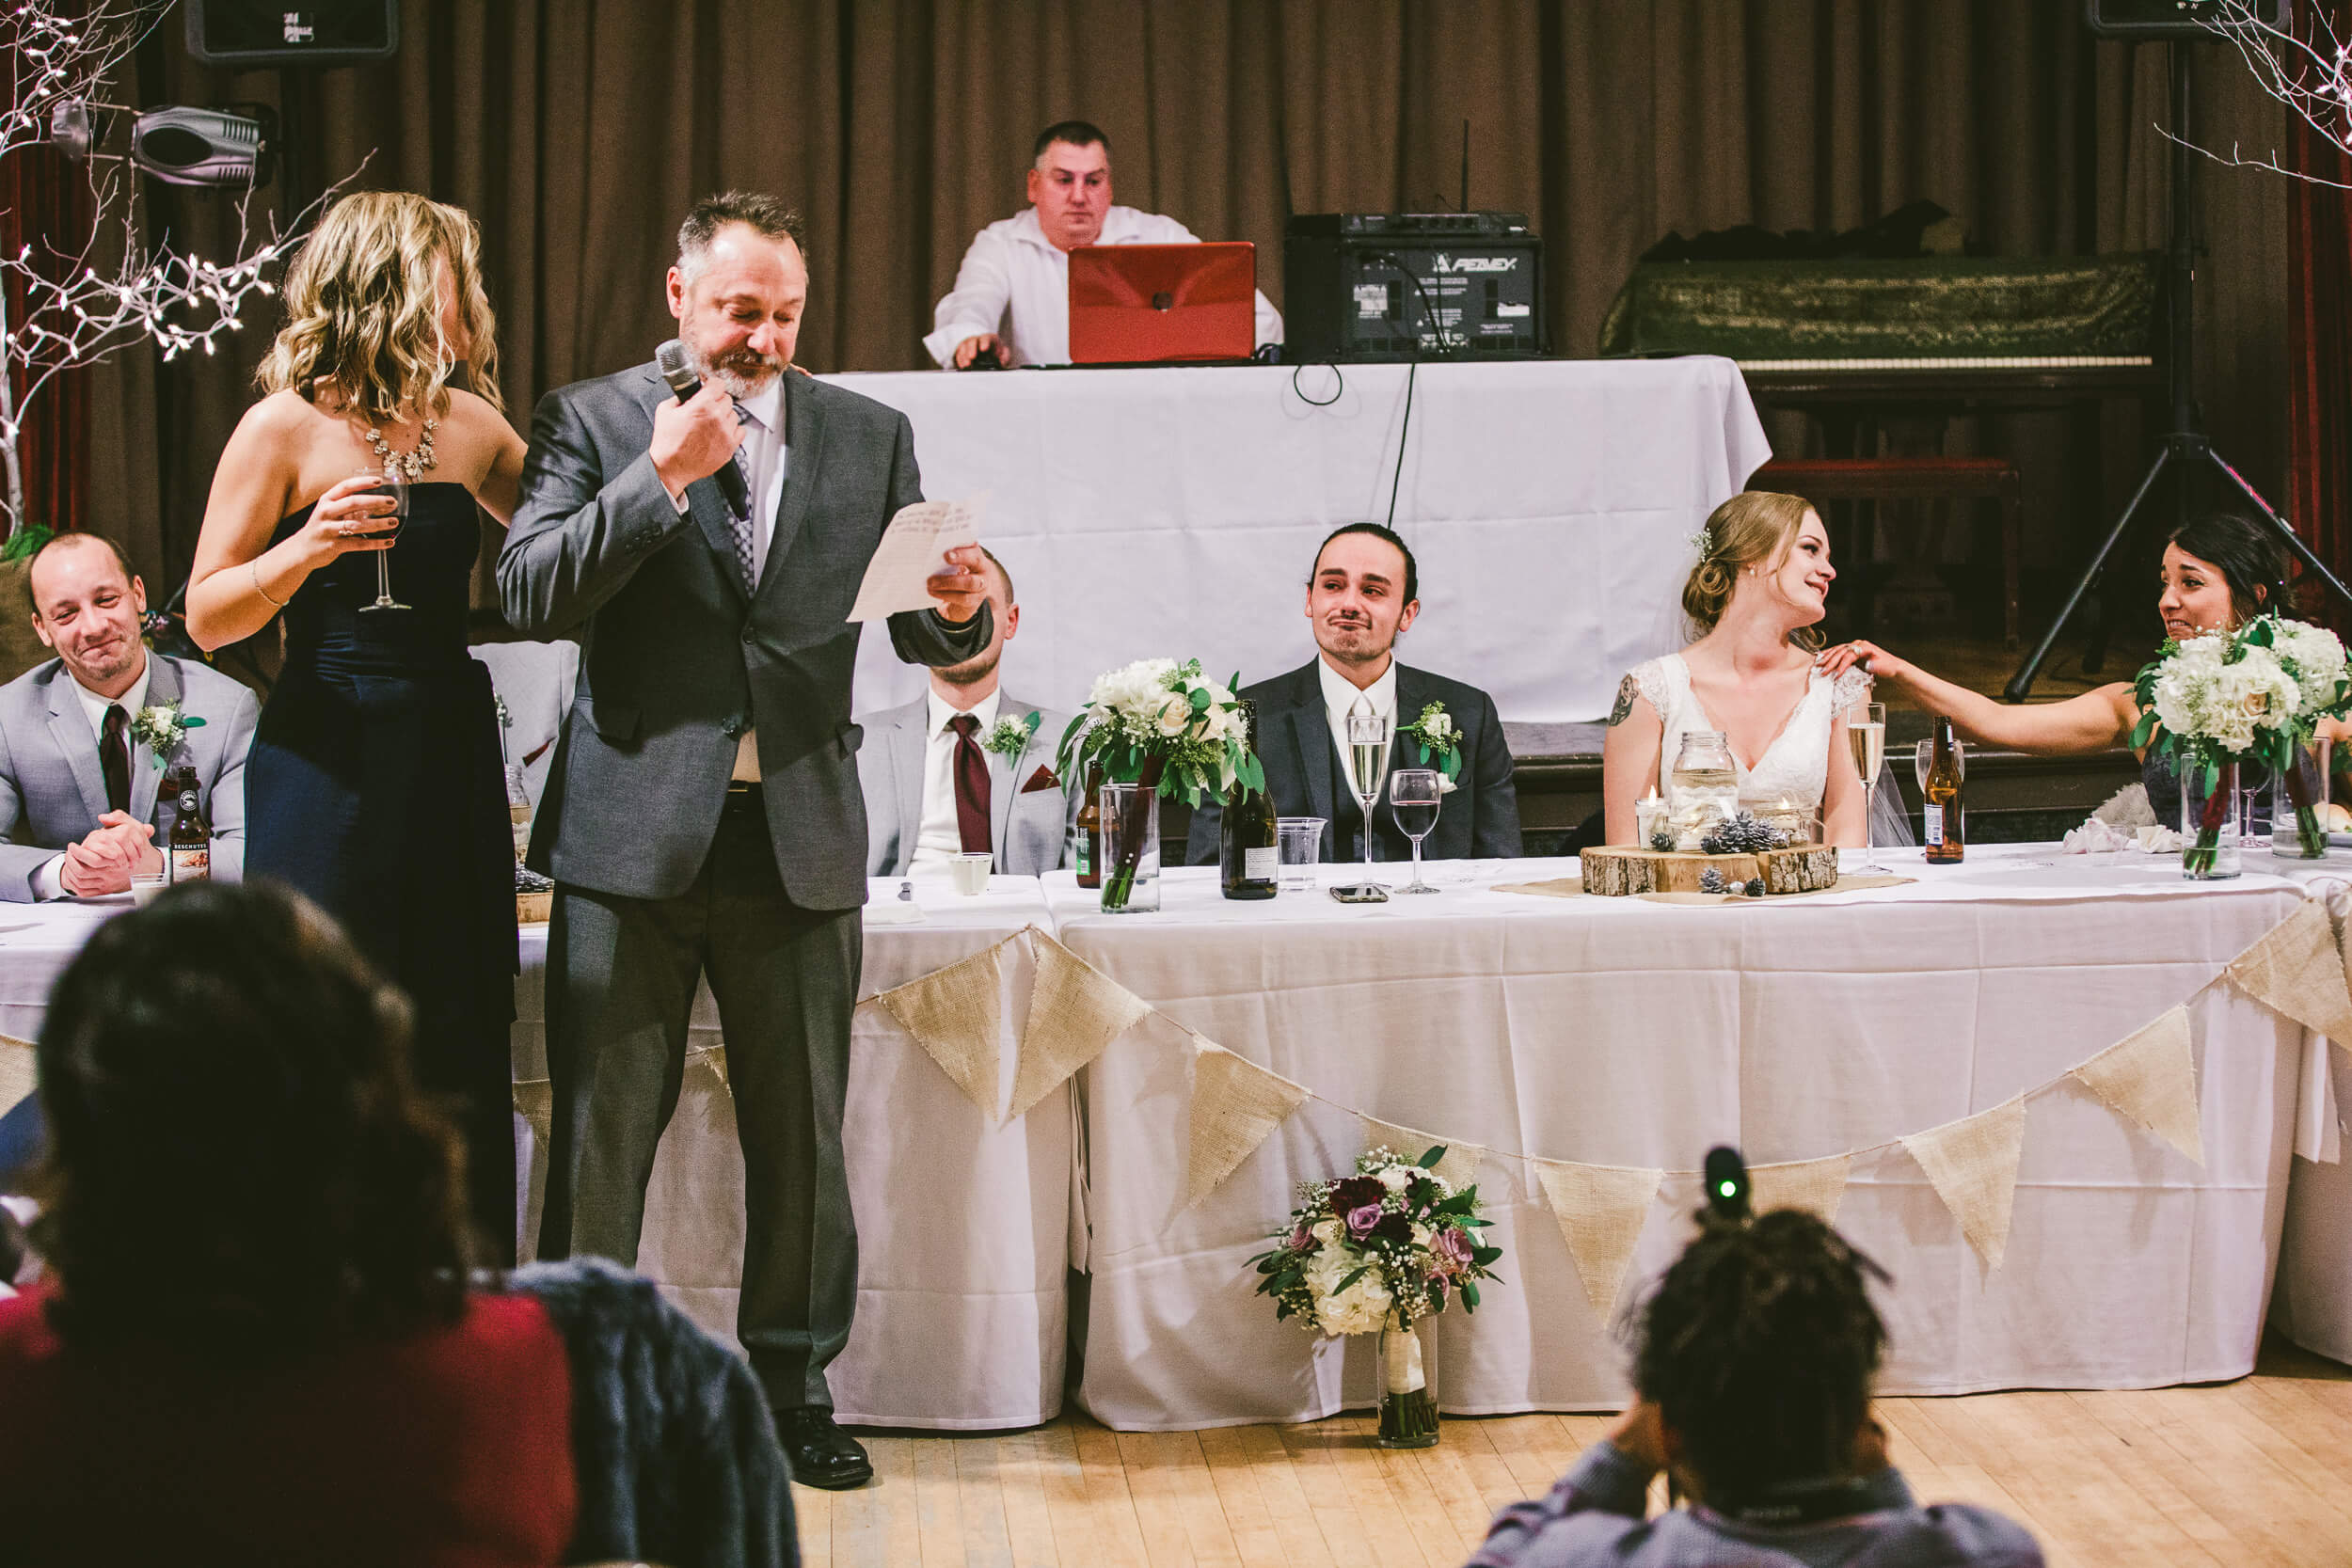 mukogawa winter wedding in spokane (262).jpg